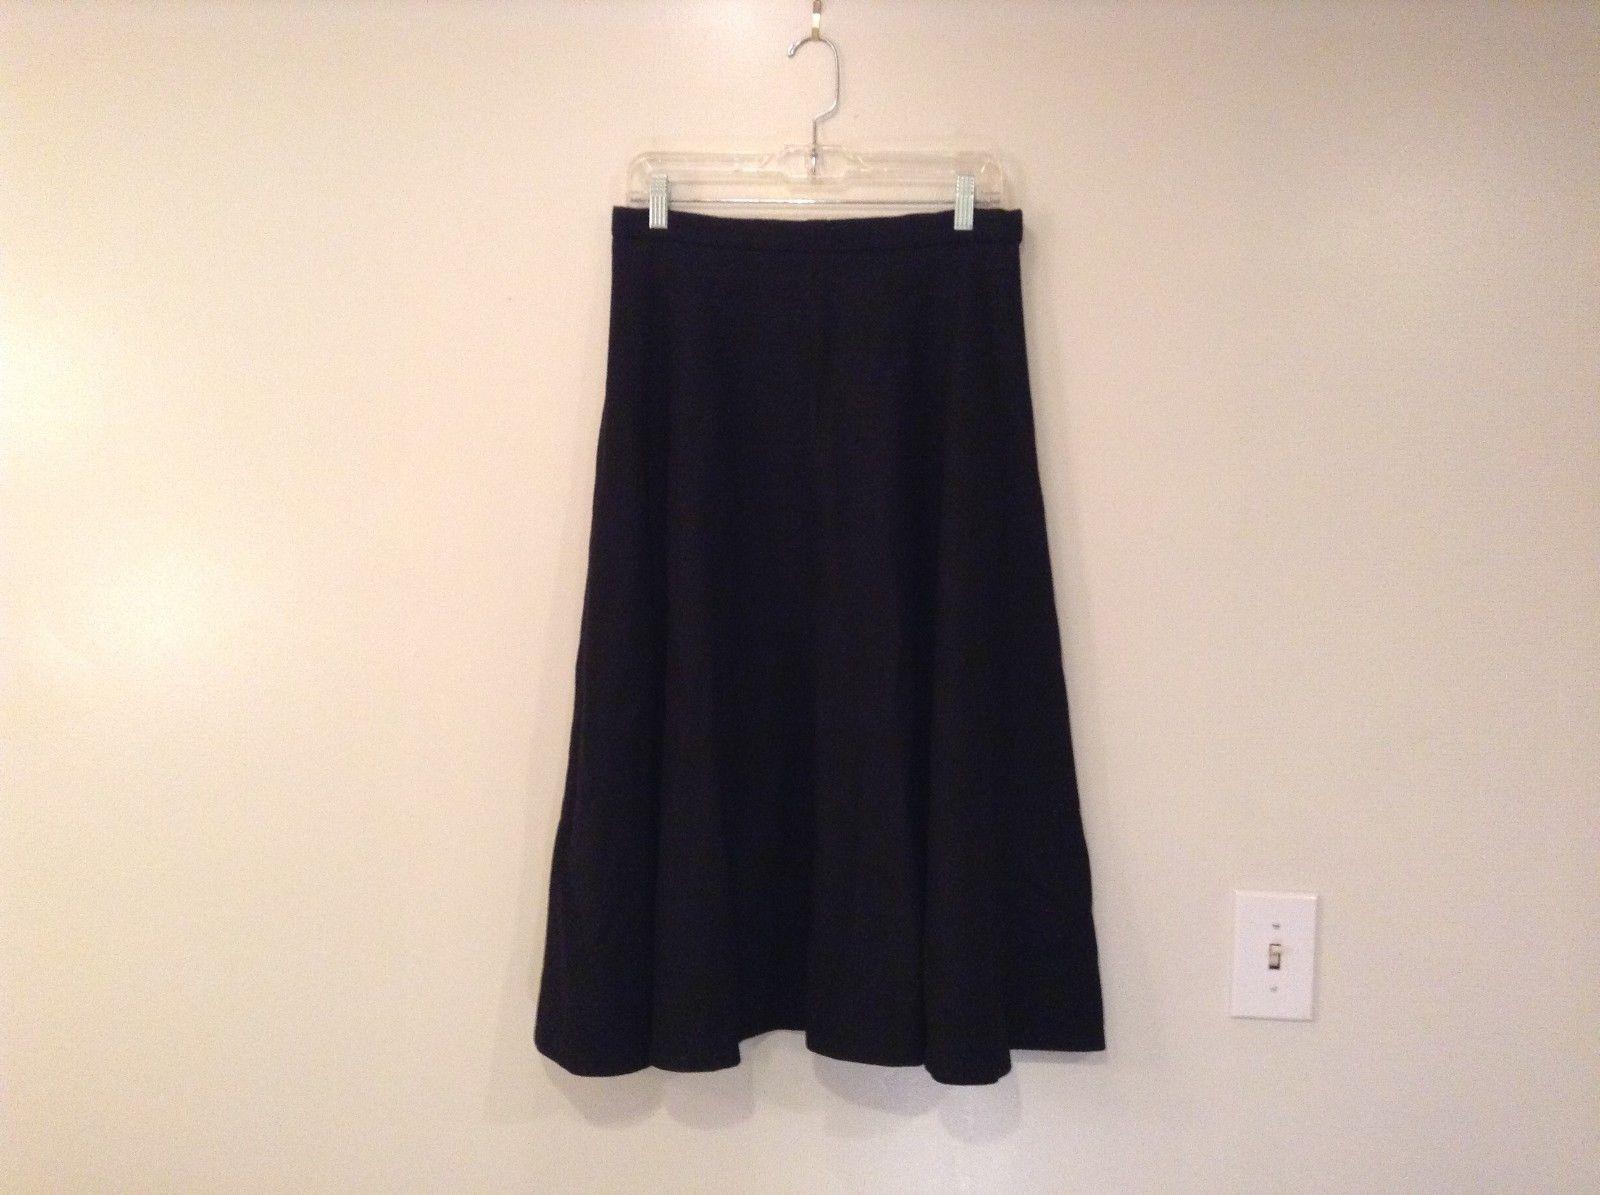 Aunt Abigail's Attic size M 100% Wool Skirt